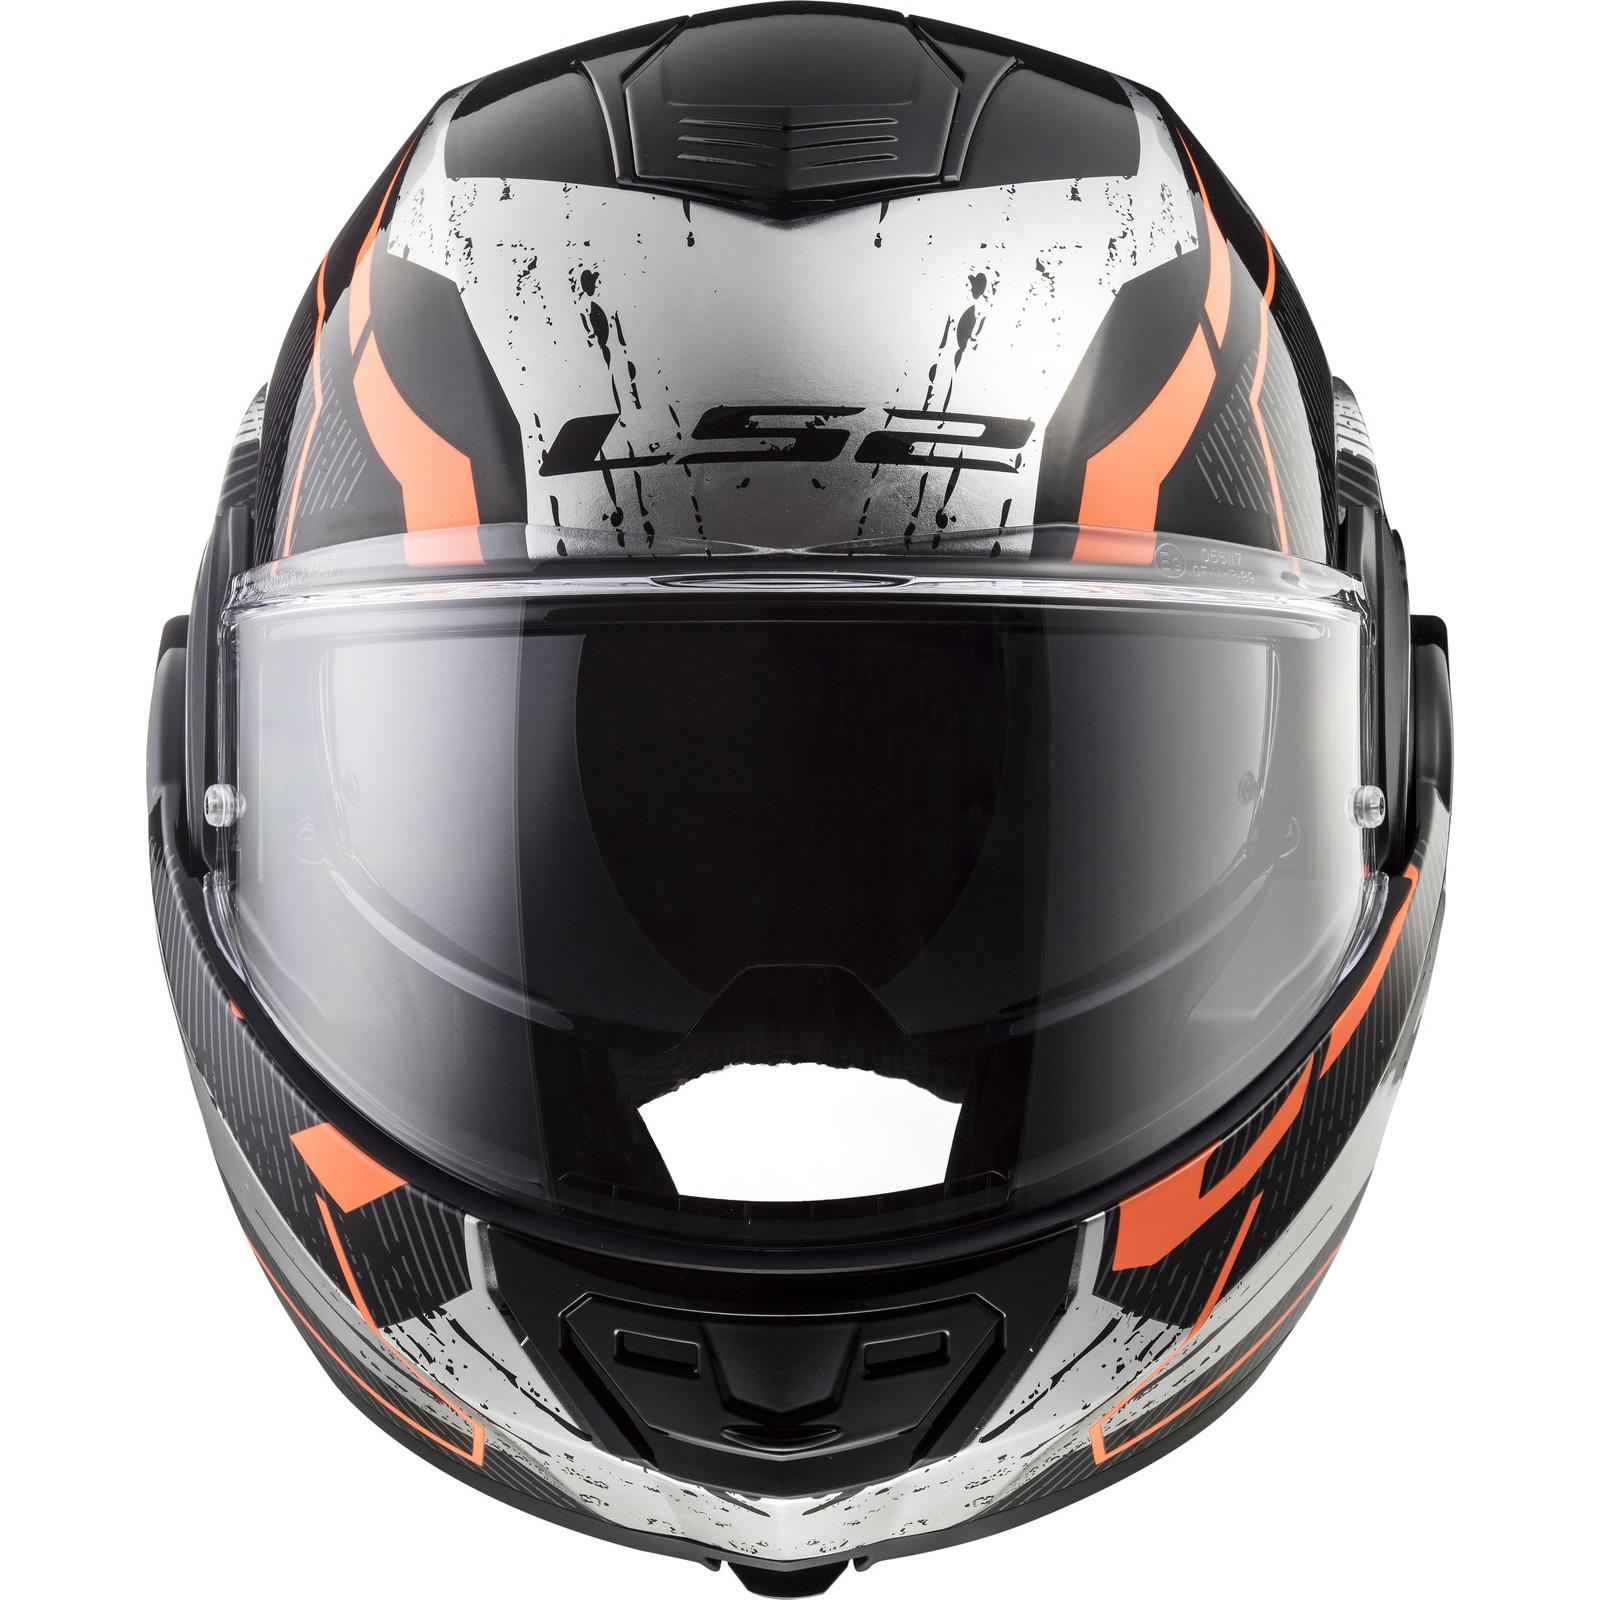 Ls2 Ff399 Valiant Roboto Black Orange Chrome Motorbike Helmet Crash